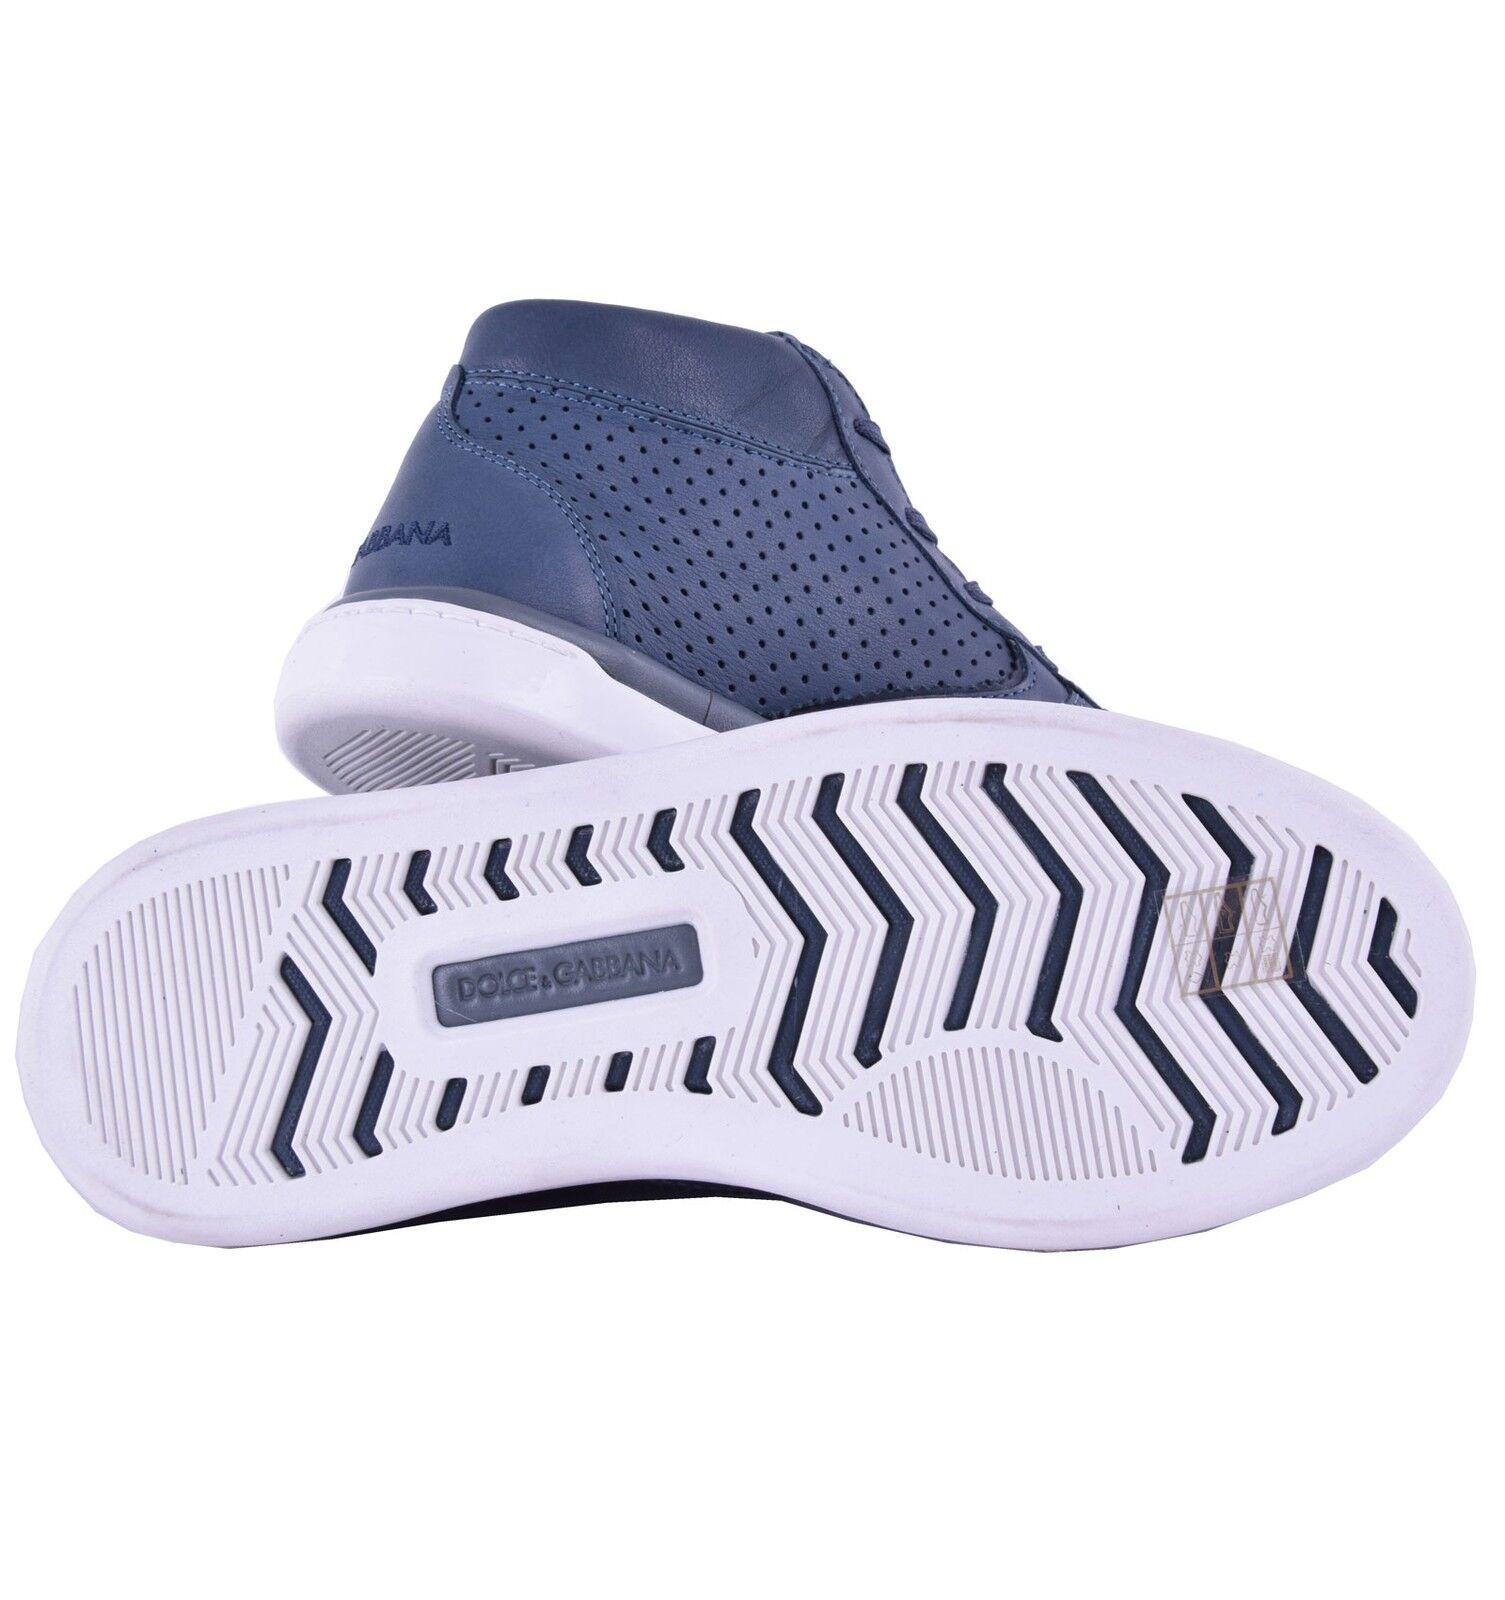 DOLCE & GABBANA Sneaker Perforierte High-Top Sneakers mit Logo Blau Sneaker GABBANA Blau 04634 869eff